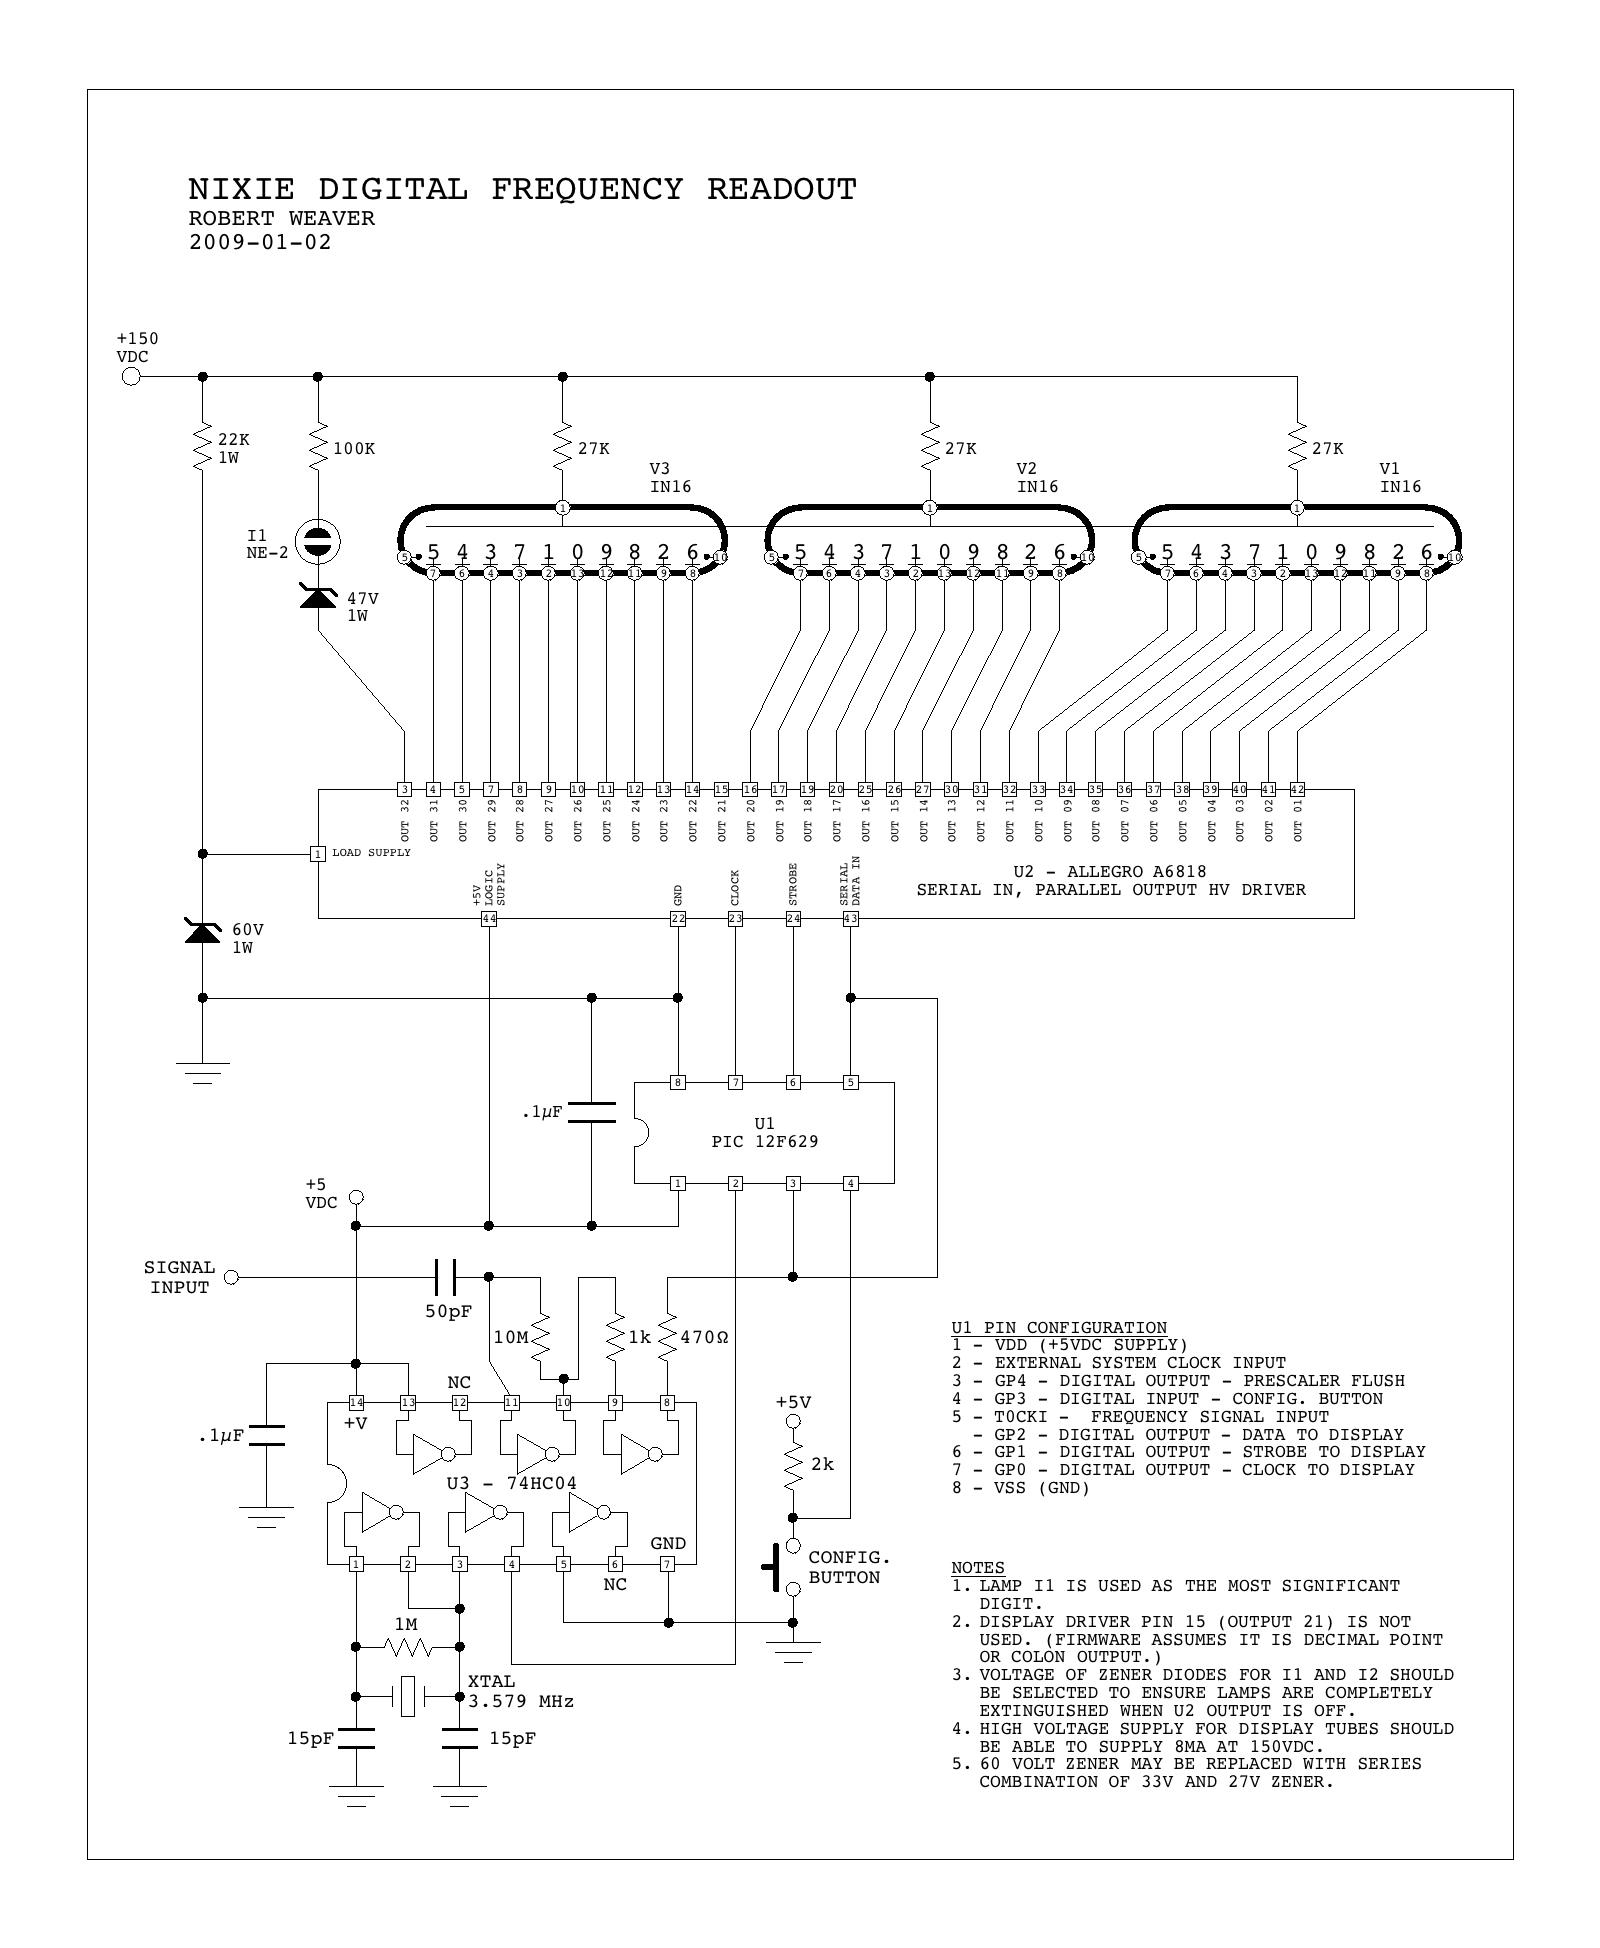 nixie driver schematics get free image about wiring diagram